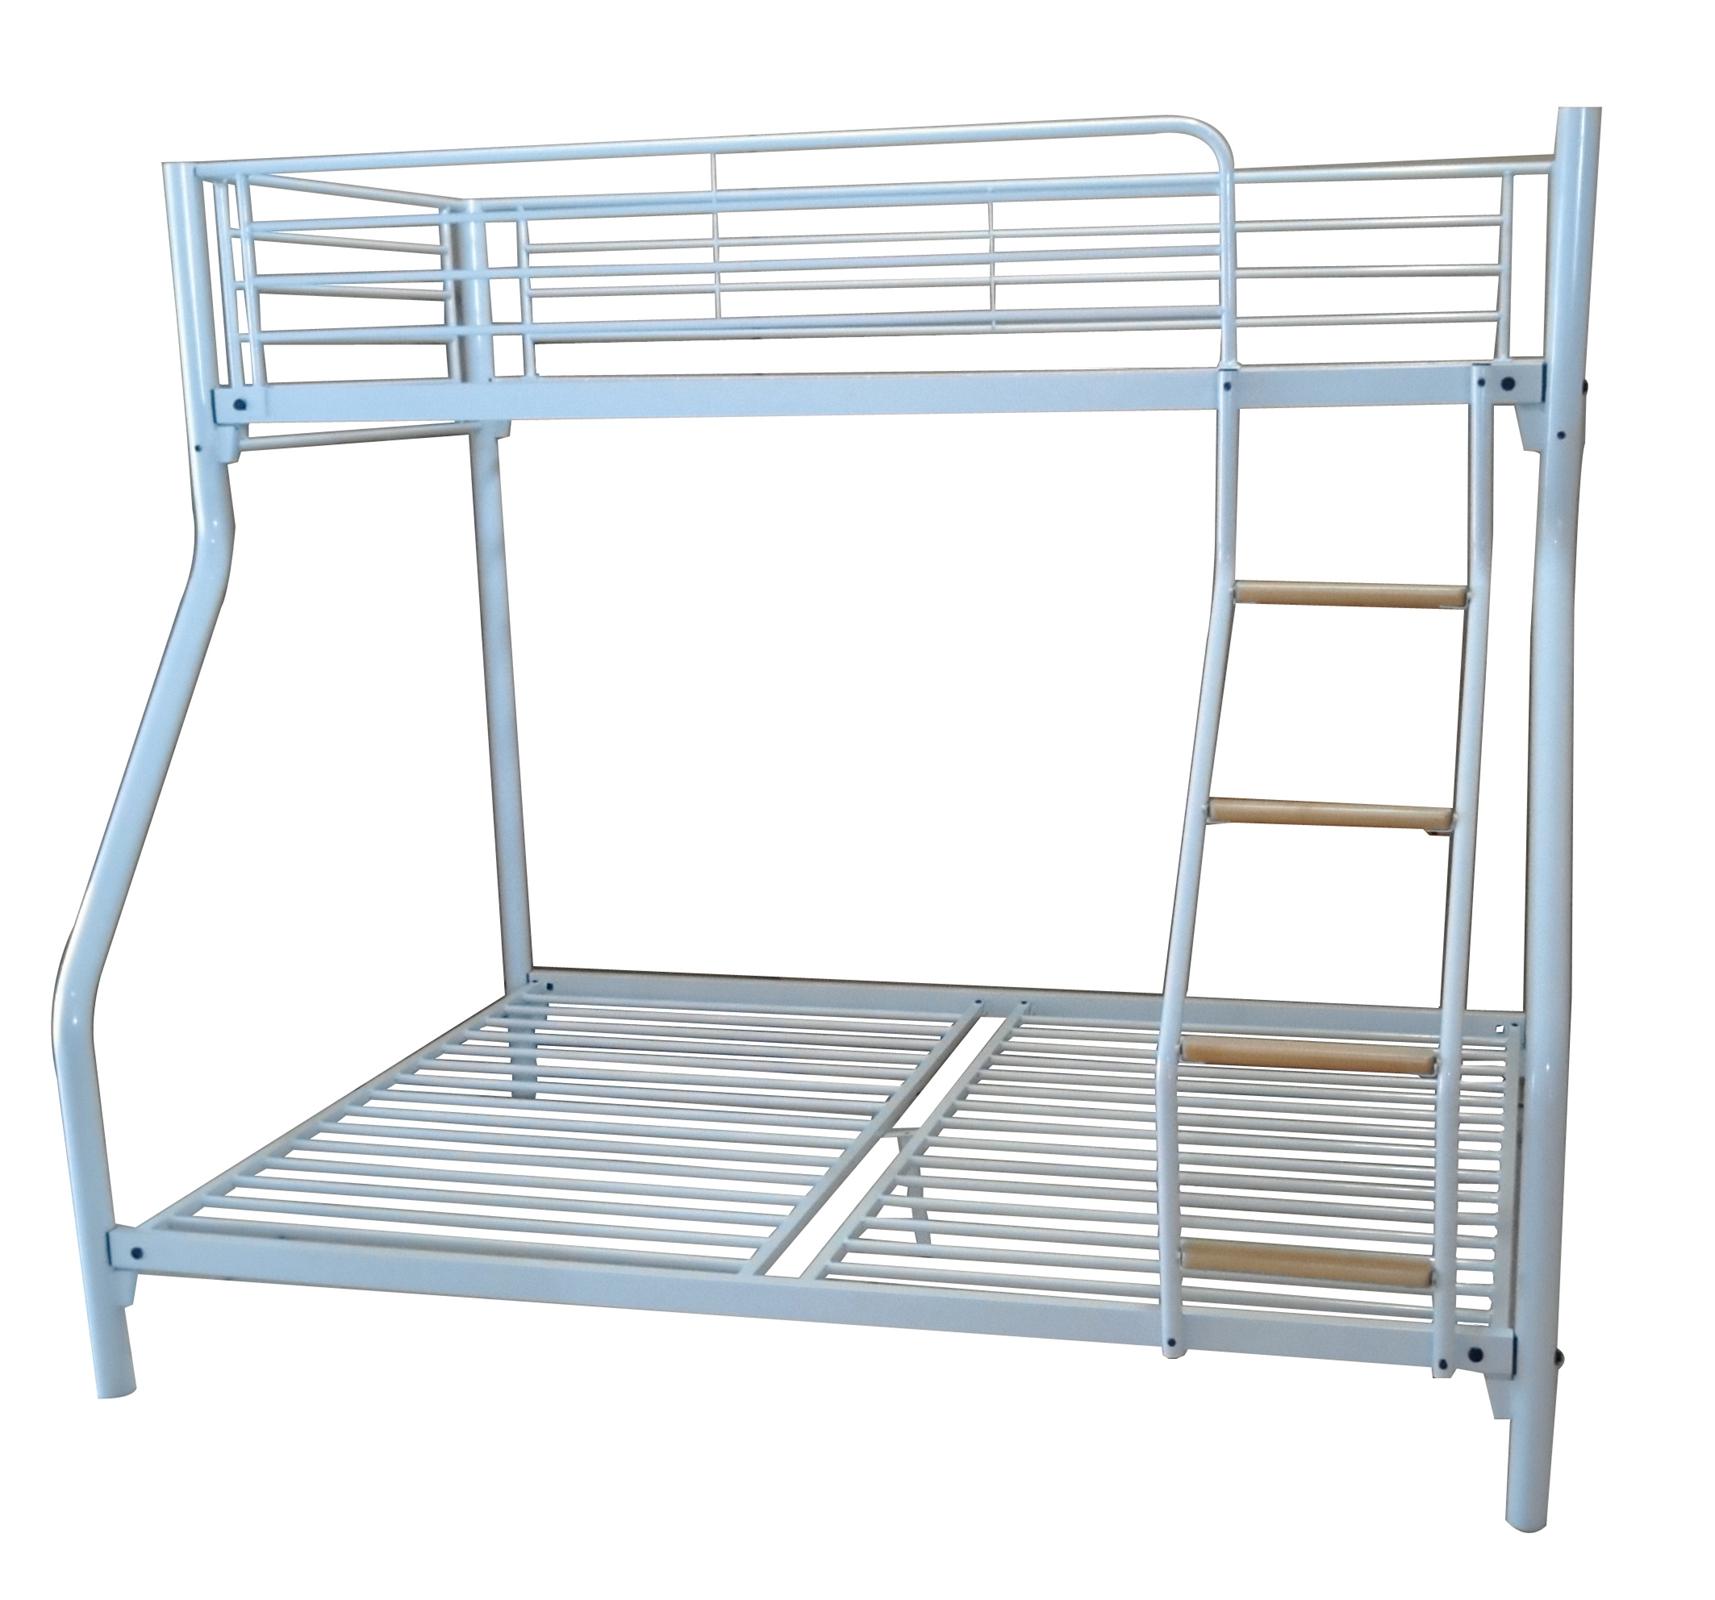 Foxhunter white kids triple sleeper bunk bed metal frame for White bunk bed frame